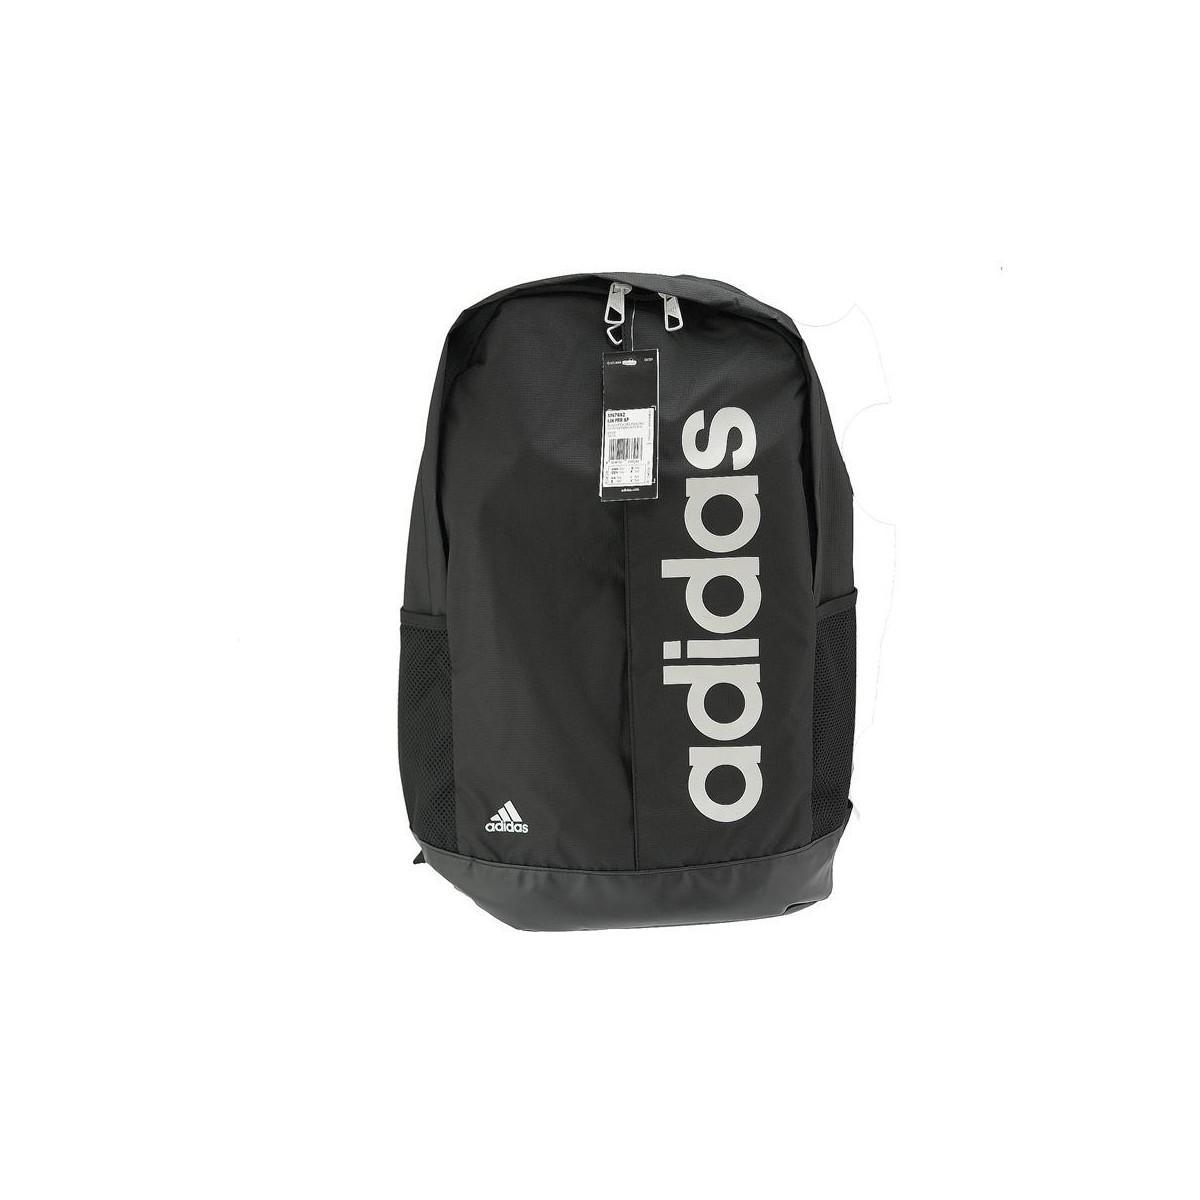 cf38a6b95c66 Adidas Originals M67882 Men s Backpack In Multicolour in Black for ...